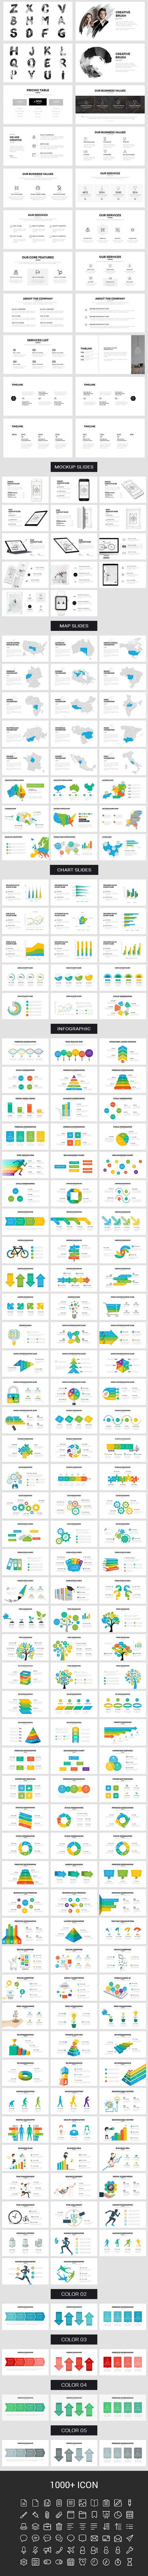 Clean Google Slides Template - 1